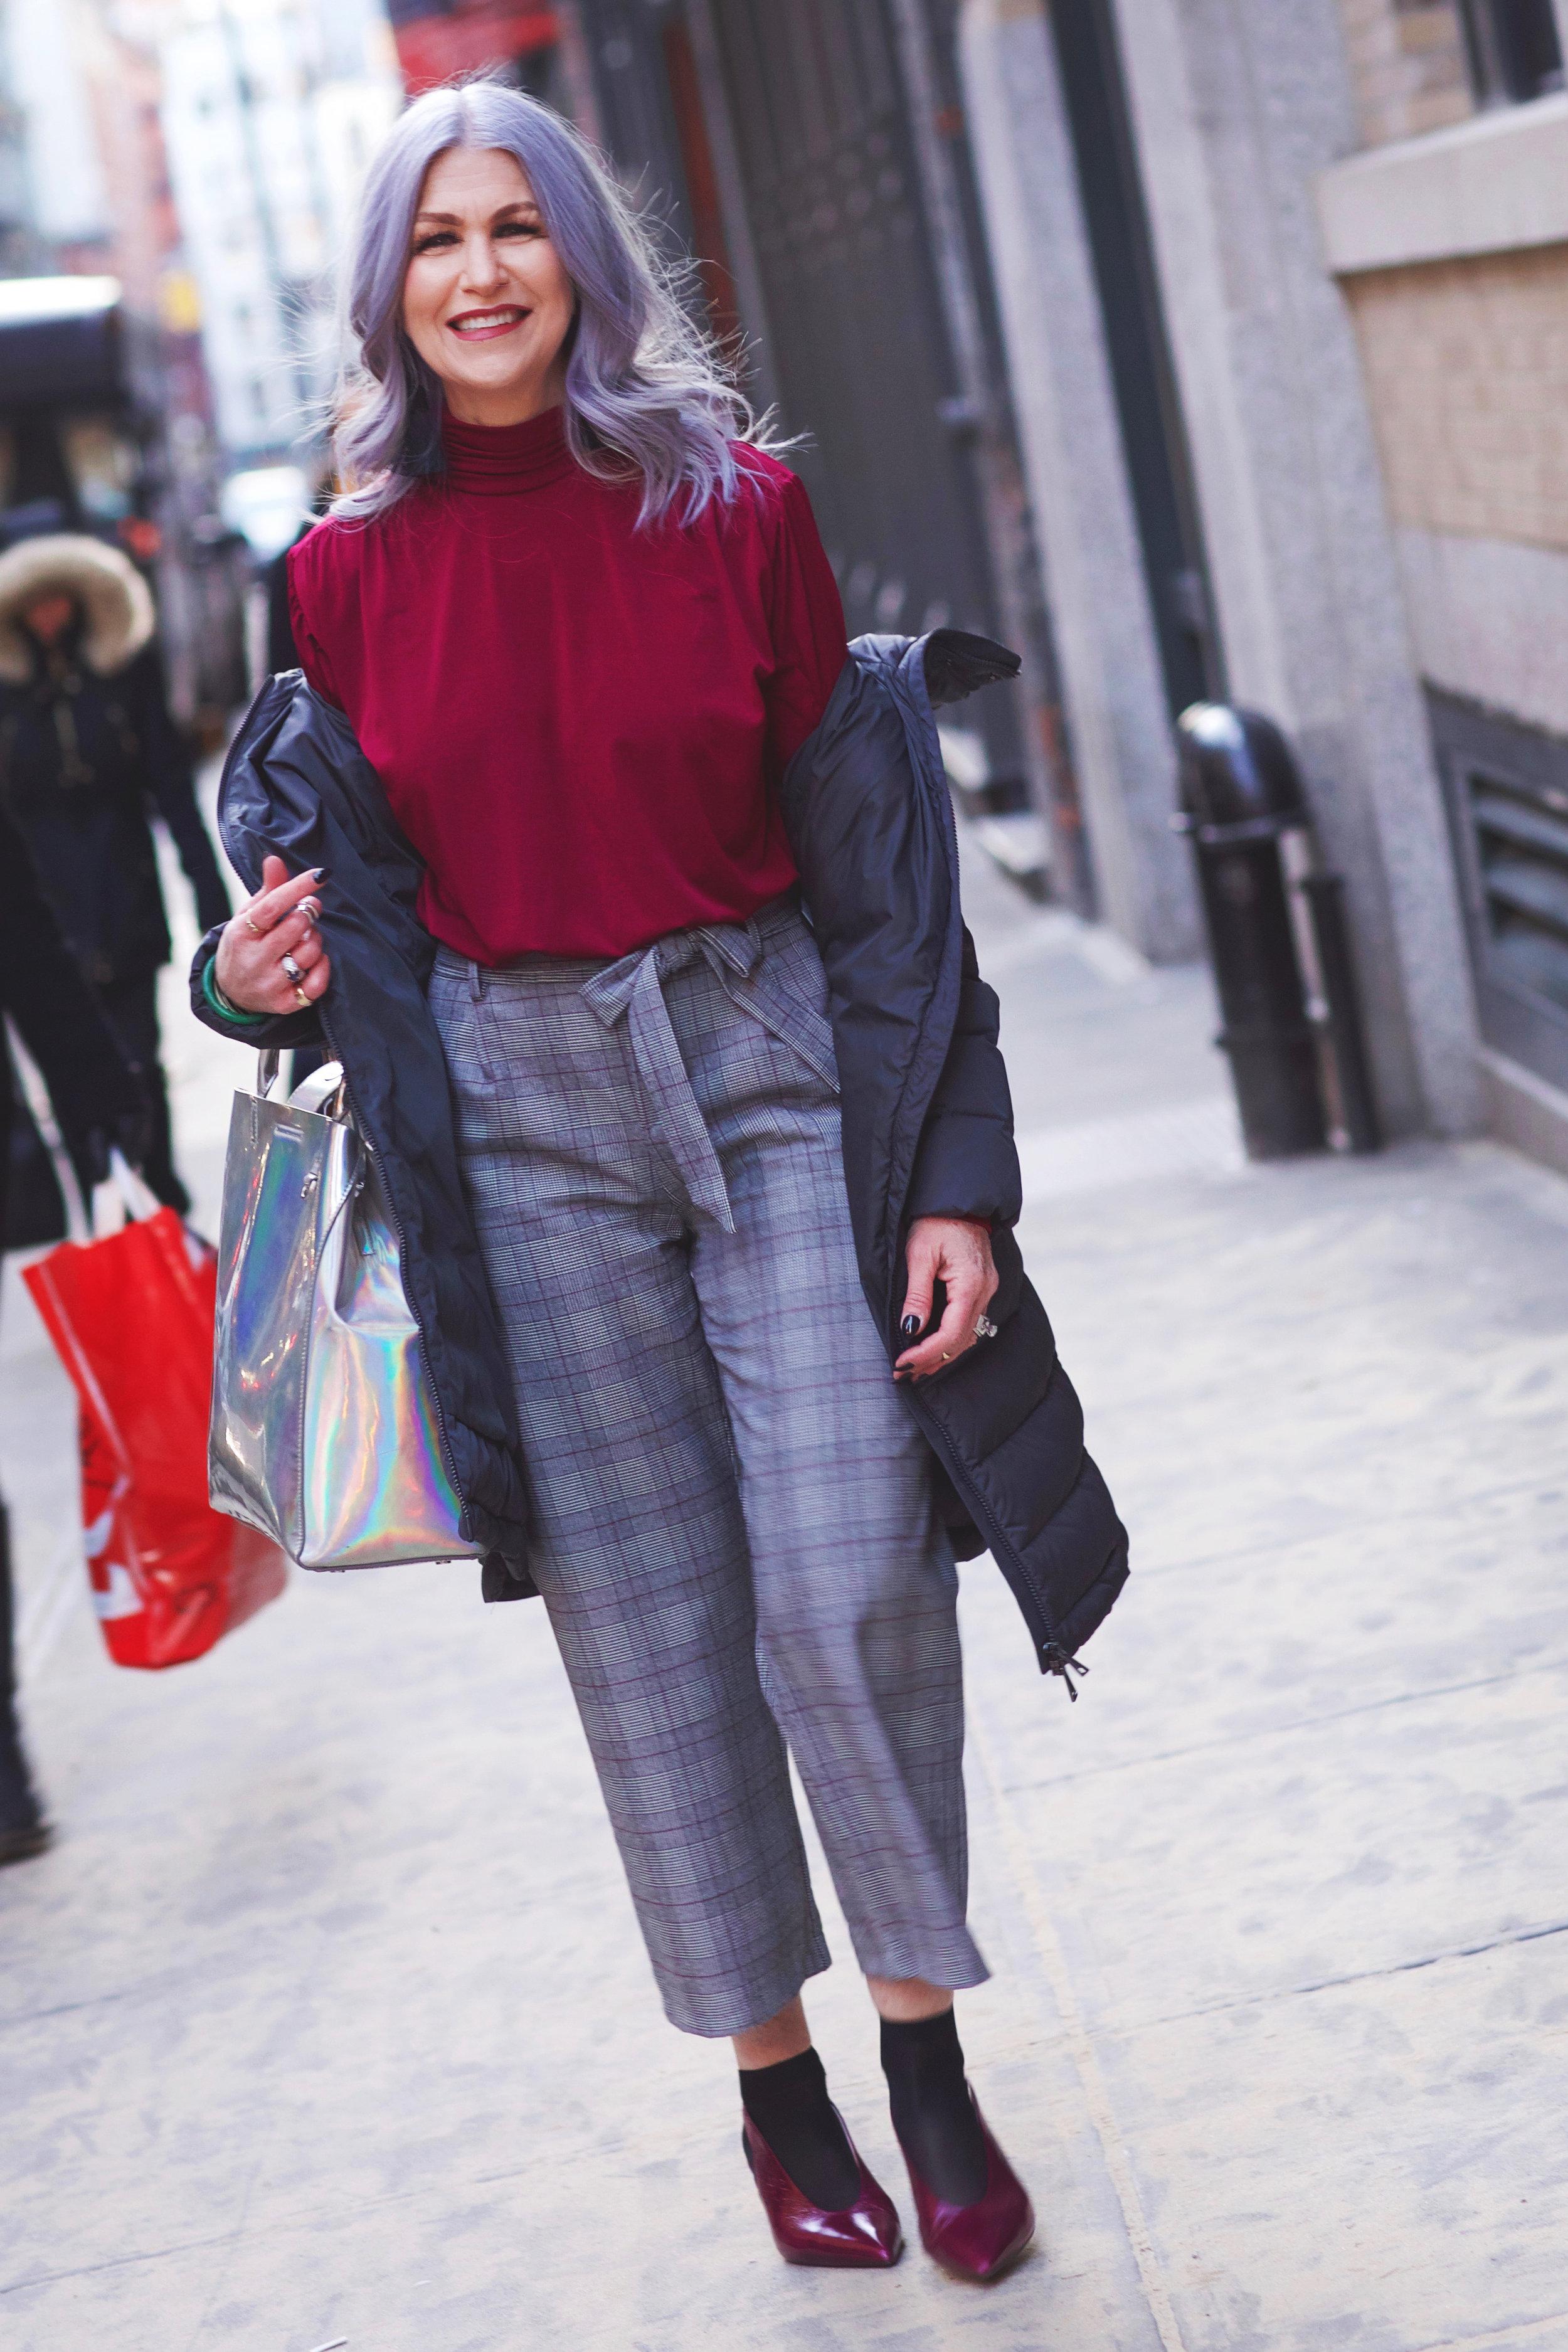 Lisa street style2.jpg